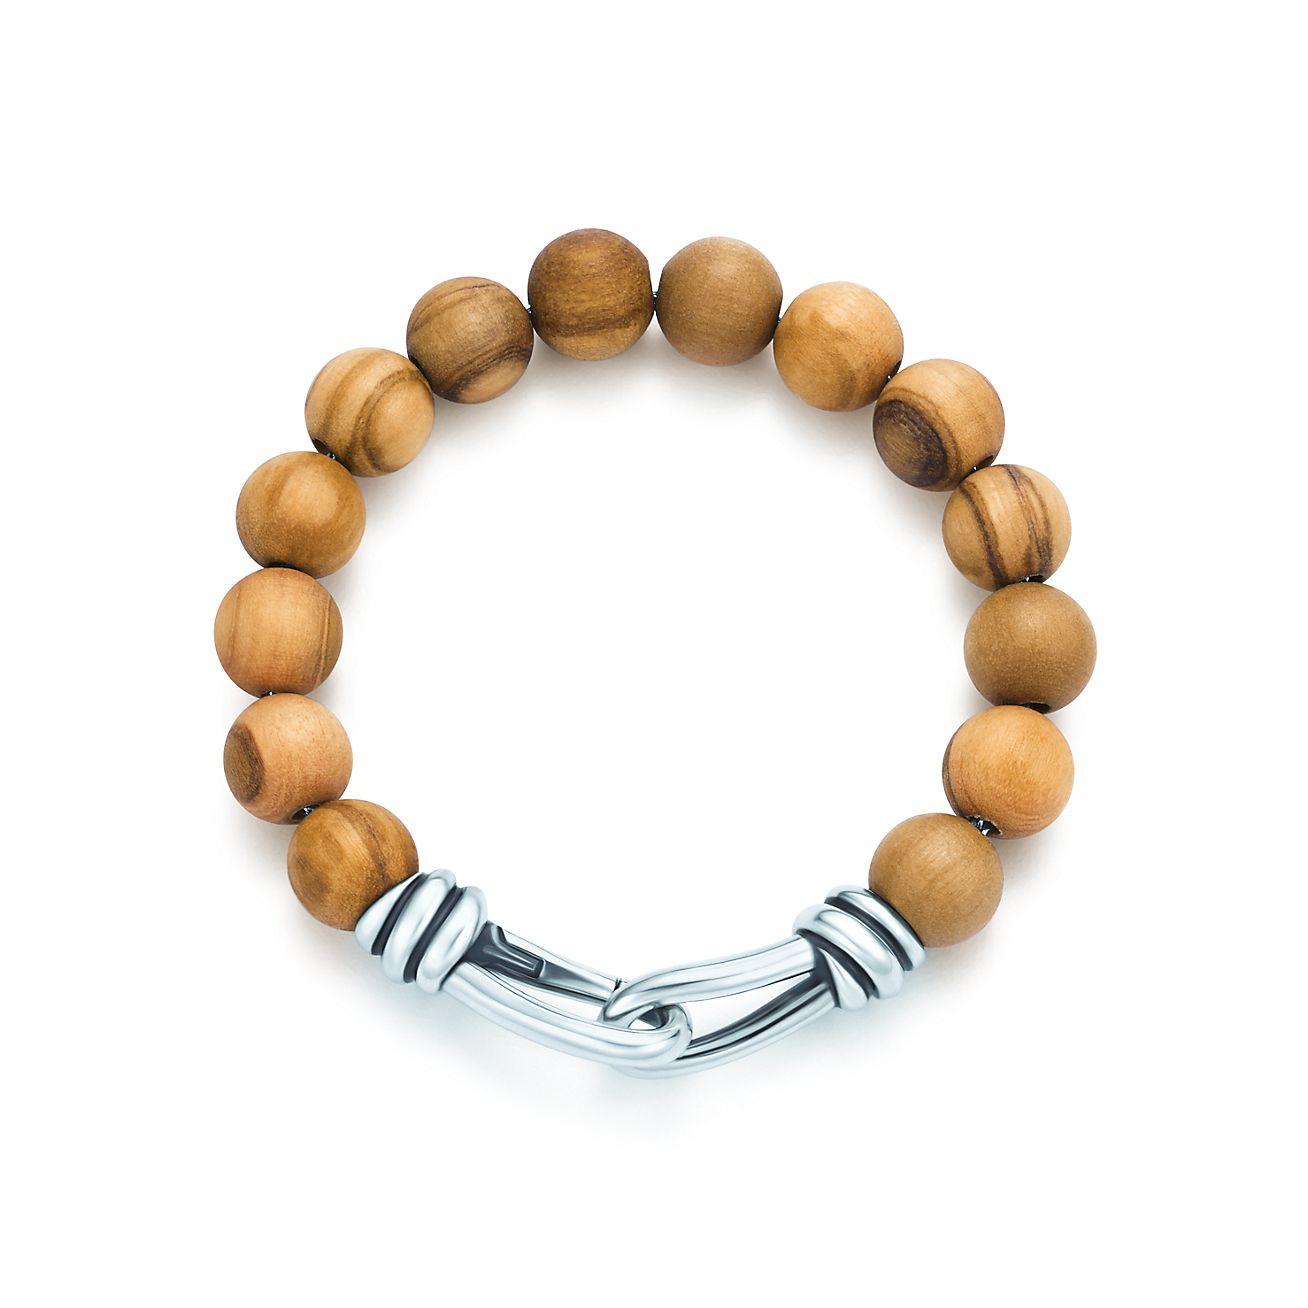 Paloma Pico Knot Bead Bracelet